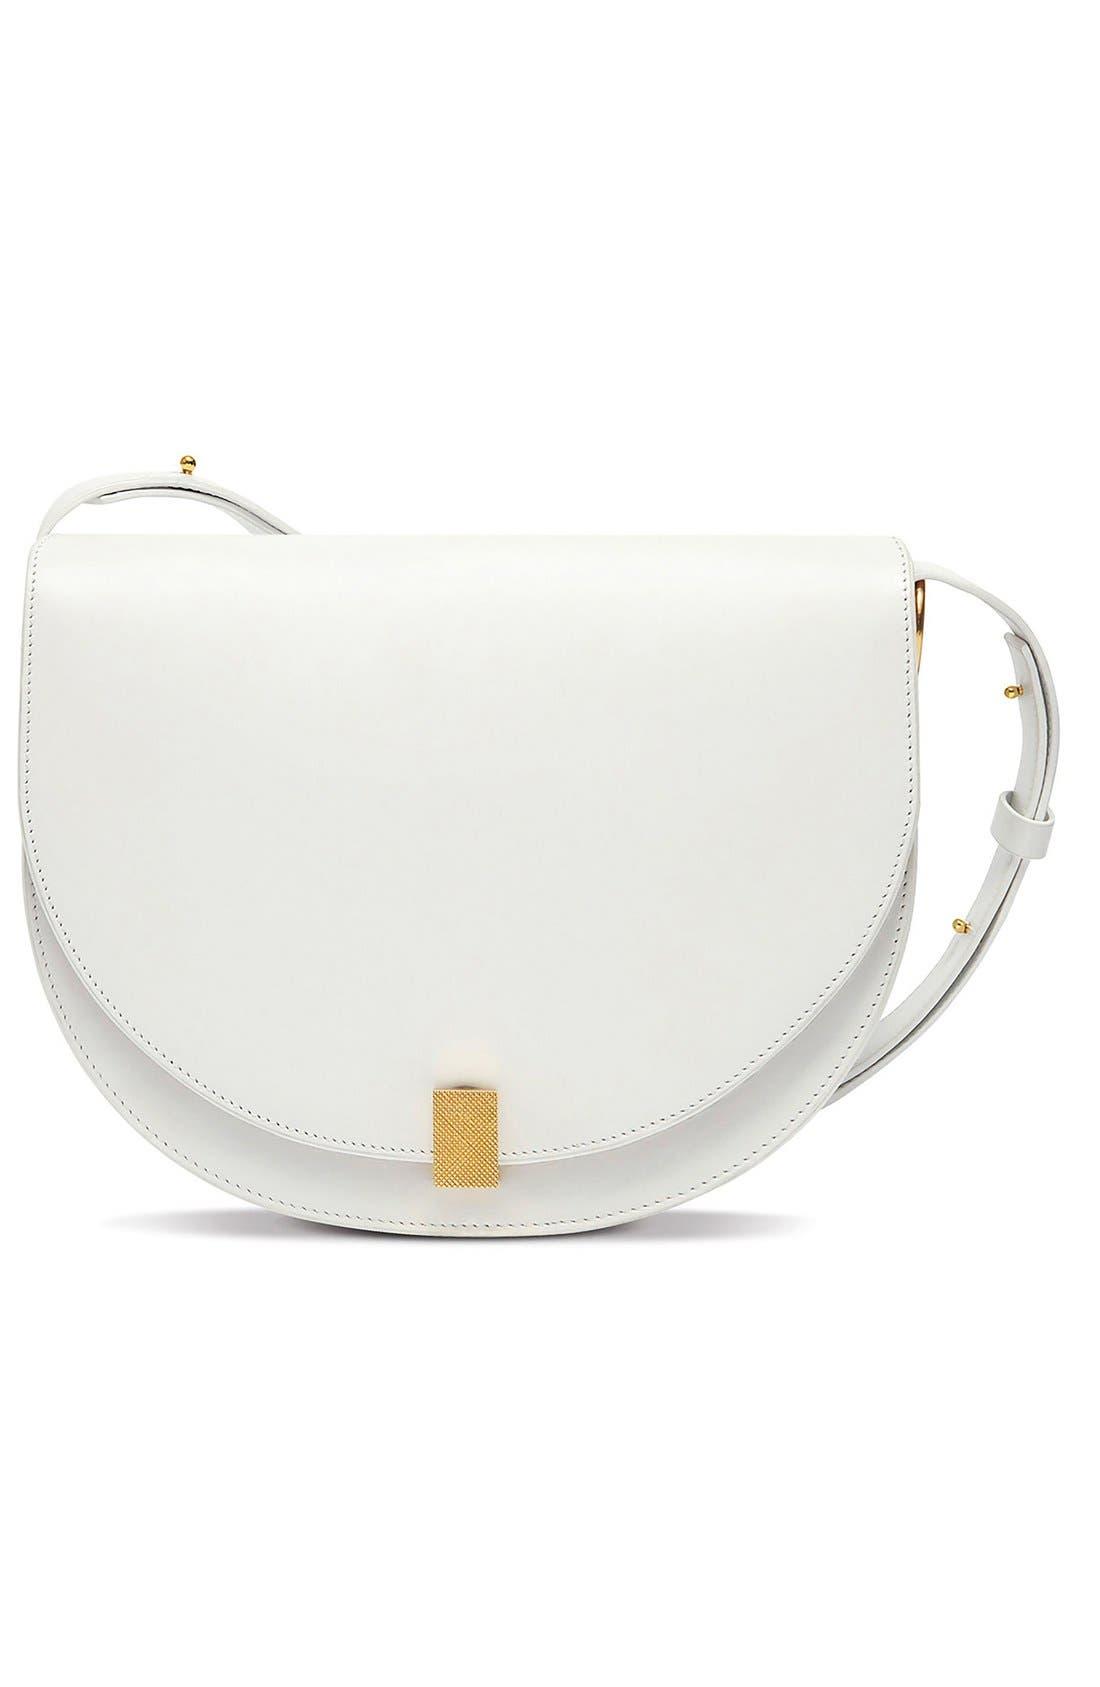 Half Moon Box Shoulder Bag,                             Main thumbnail 1, color,                             WHITE